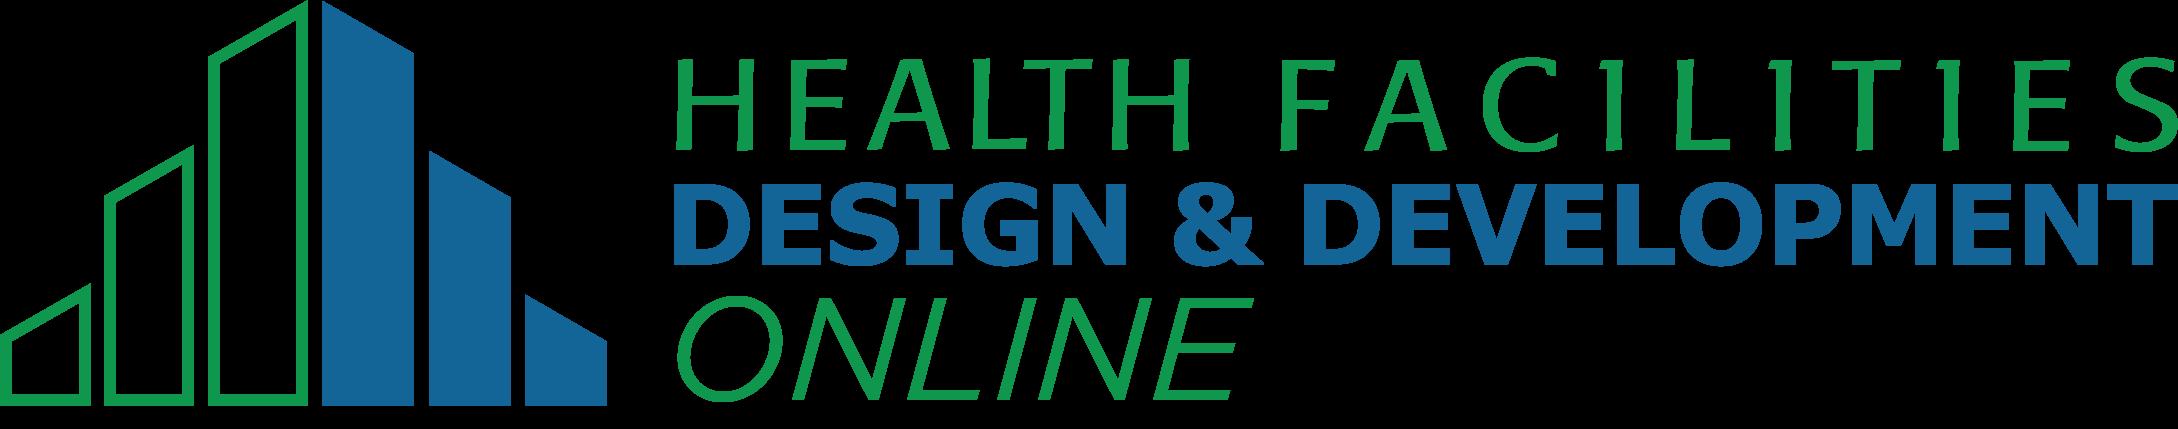 Health Facilities Design and Development Victoria Online